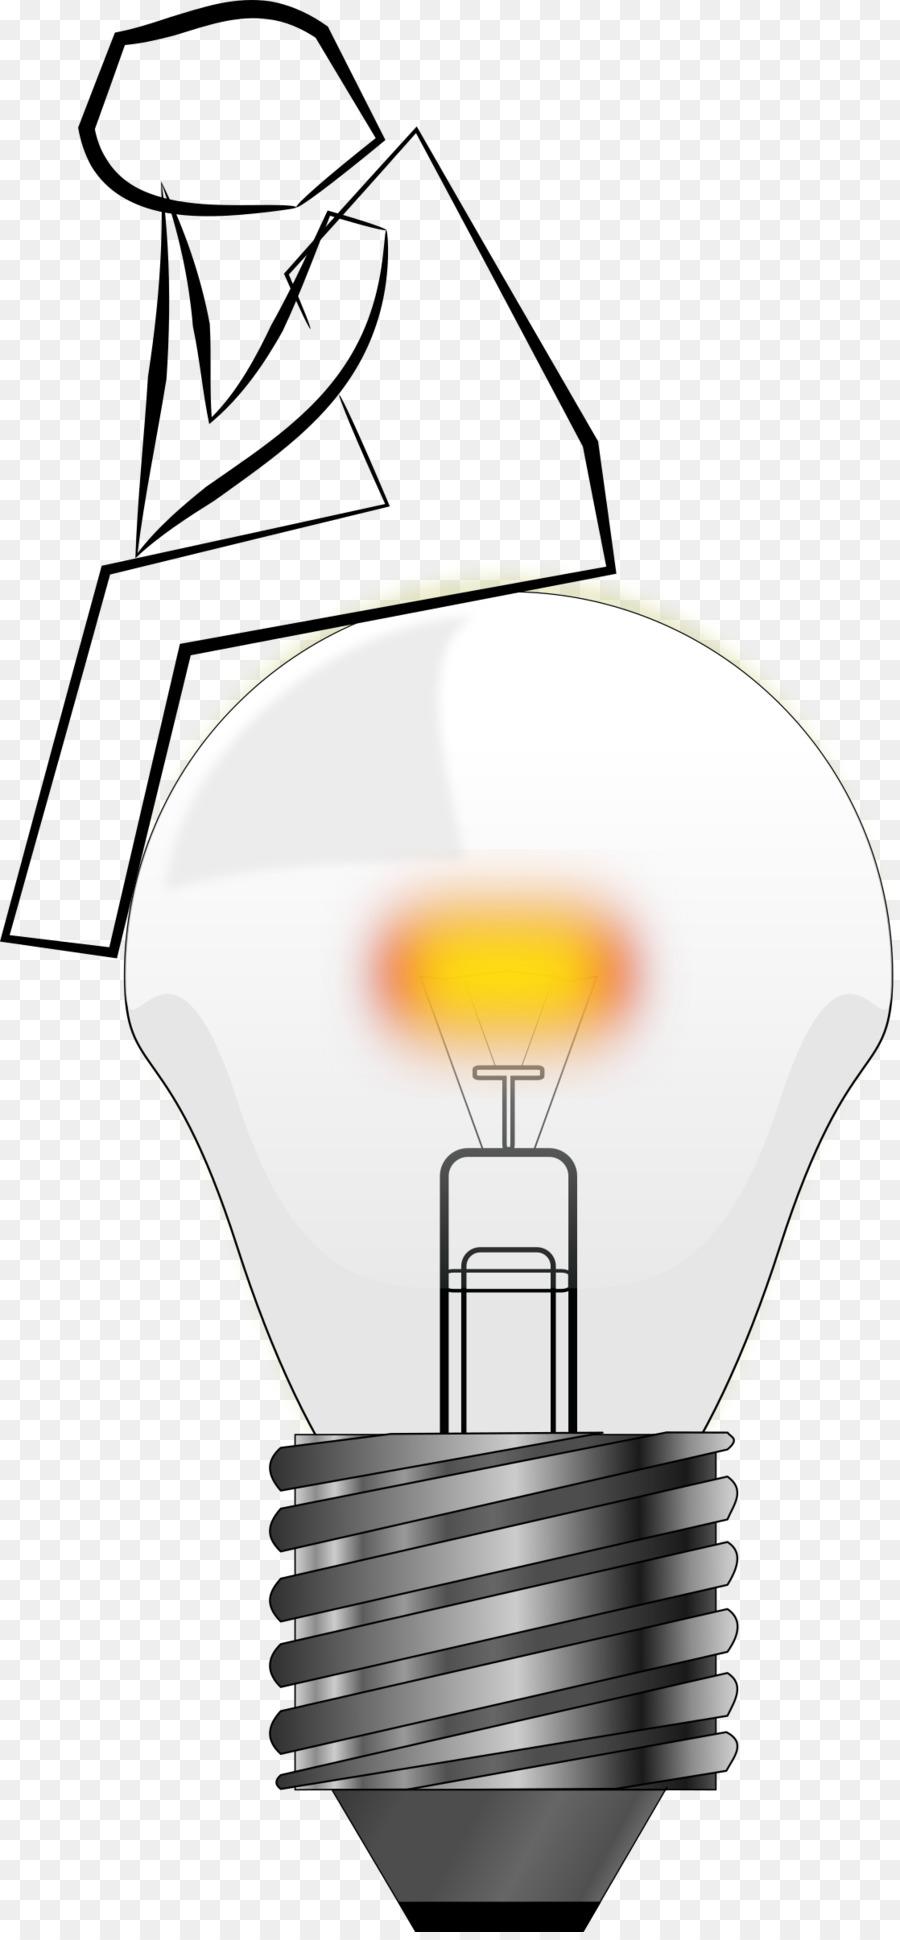 Incandescent Light Bulb Lamp Electric Clip Art